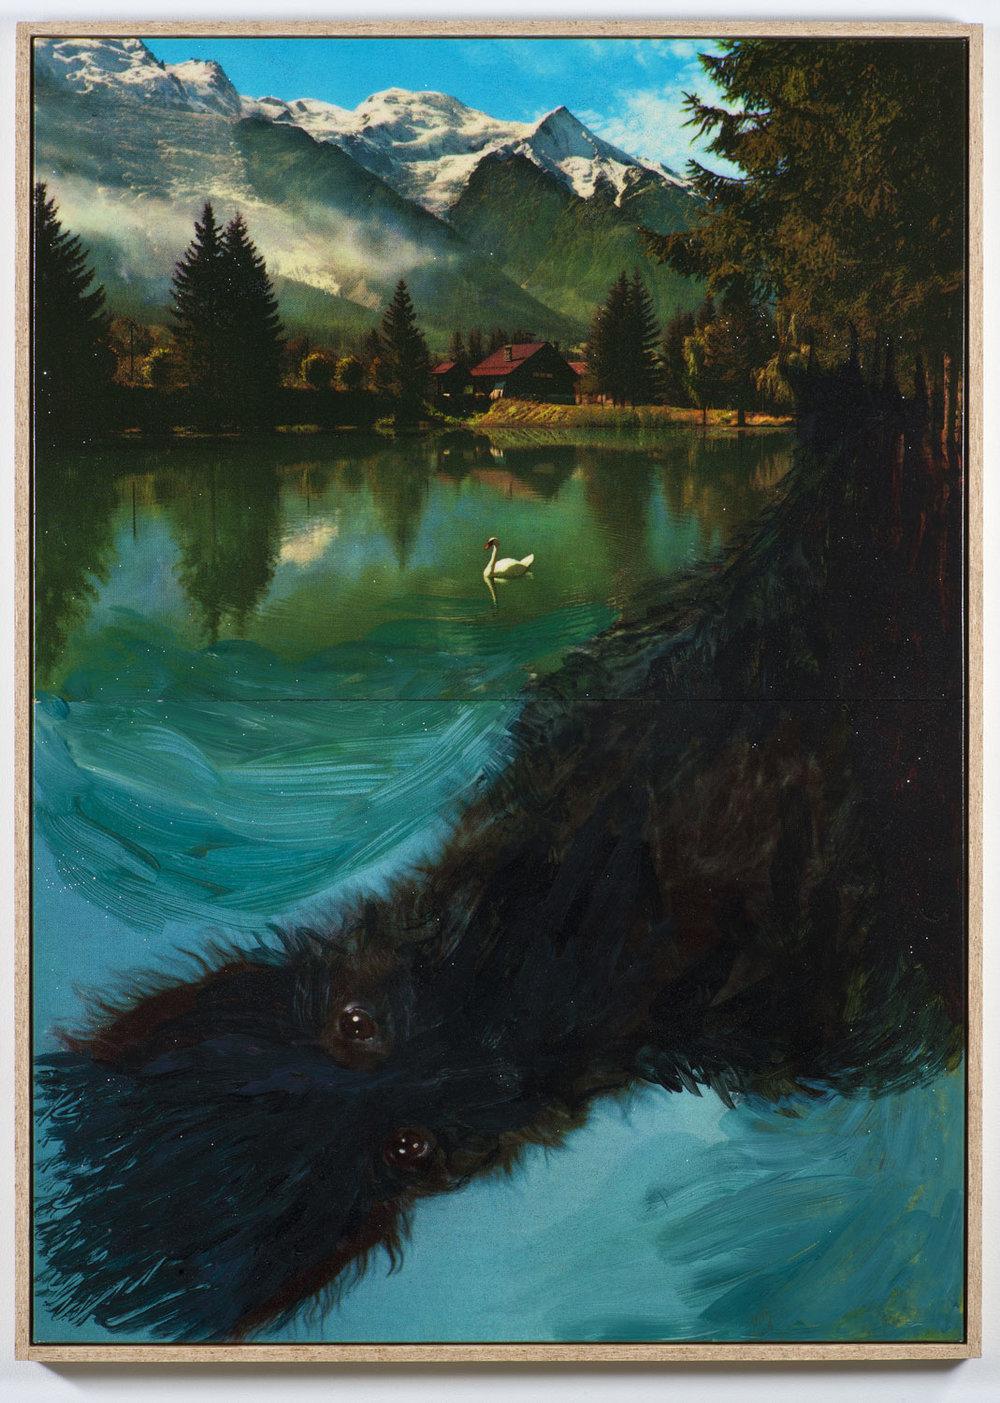 Pierre Ardouvin   Ecran de veille (Screensaver) , 2013 print on canvas, resin, glitter, chipboard framing  66 15/16 x 47 1/4 in (170 x 120 cm)  PA13P1